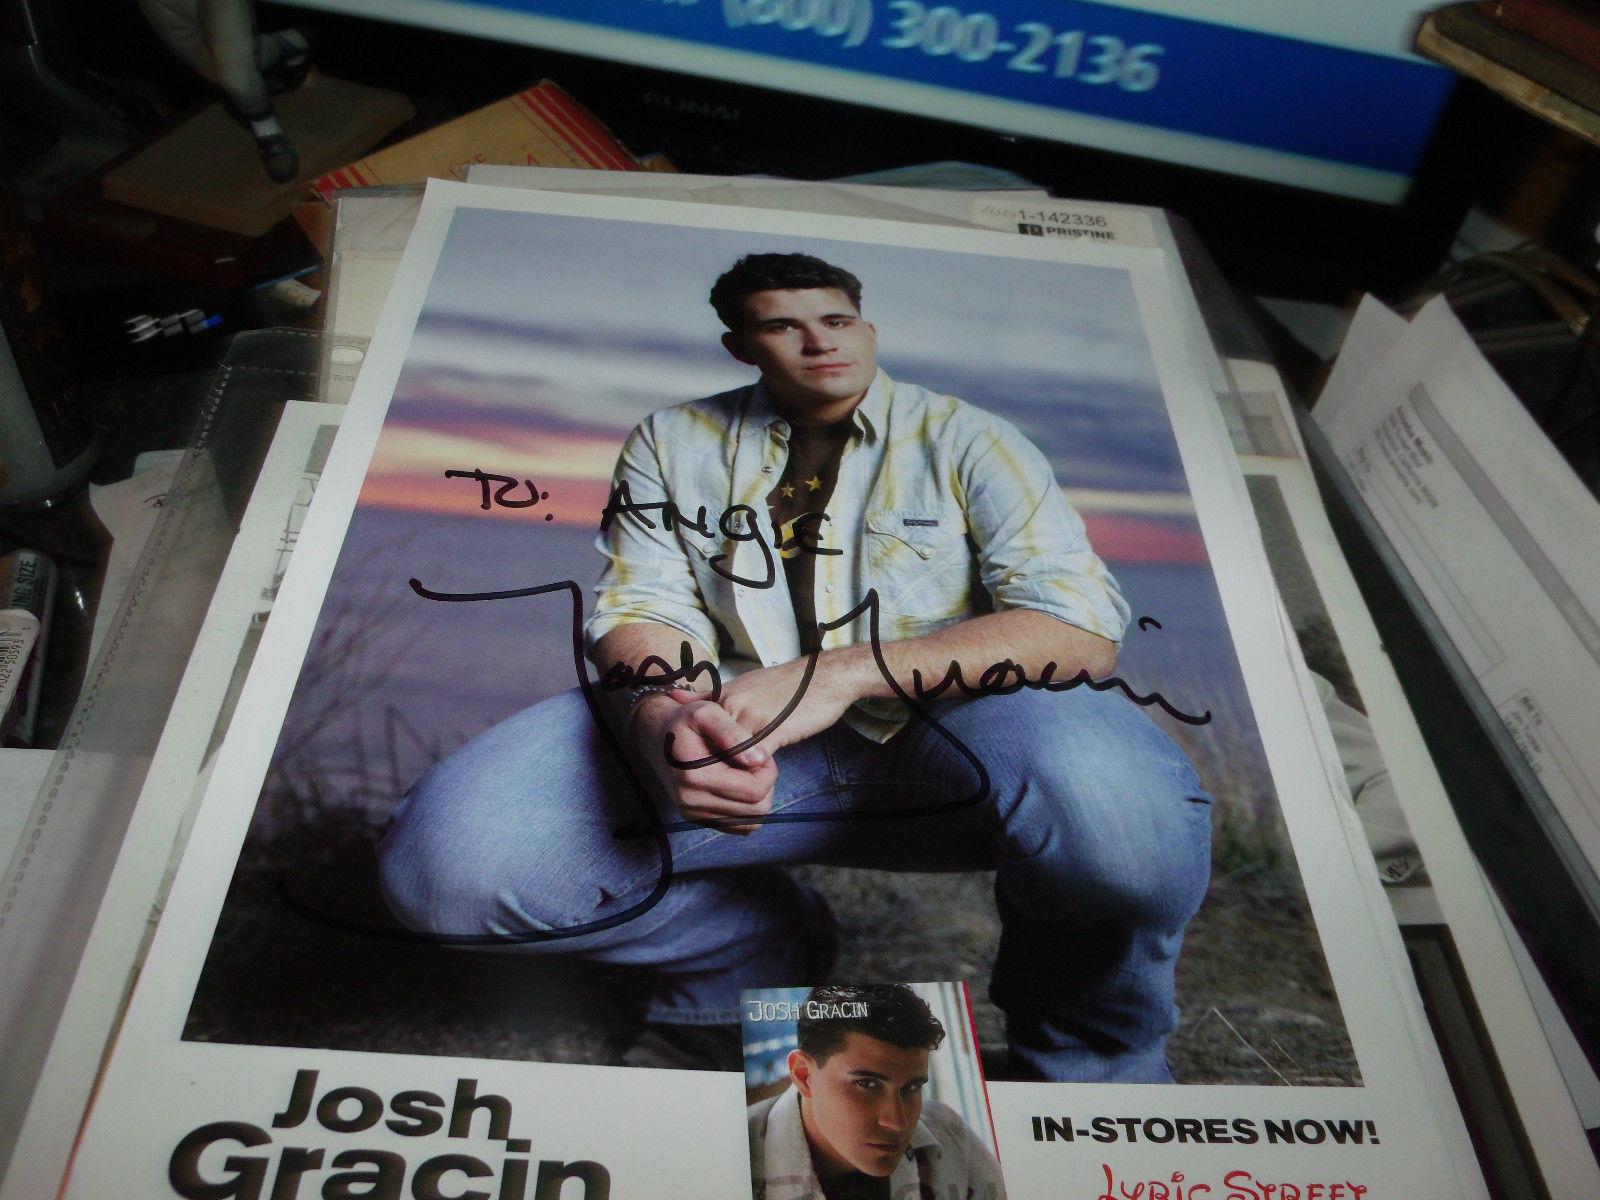 JOSH GRACIN HAND SIGNED 8X10 PHOTO W/ BONUS PROMO MATERIAL